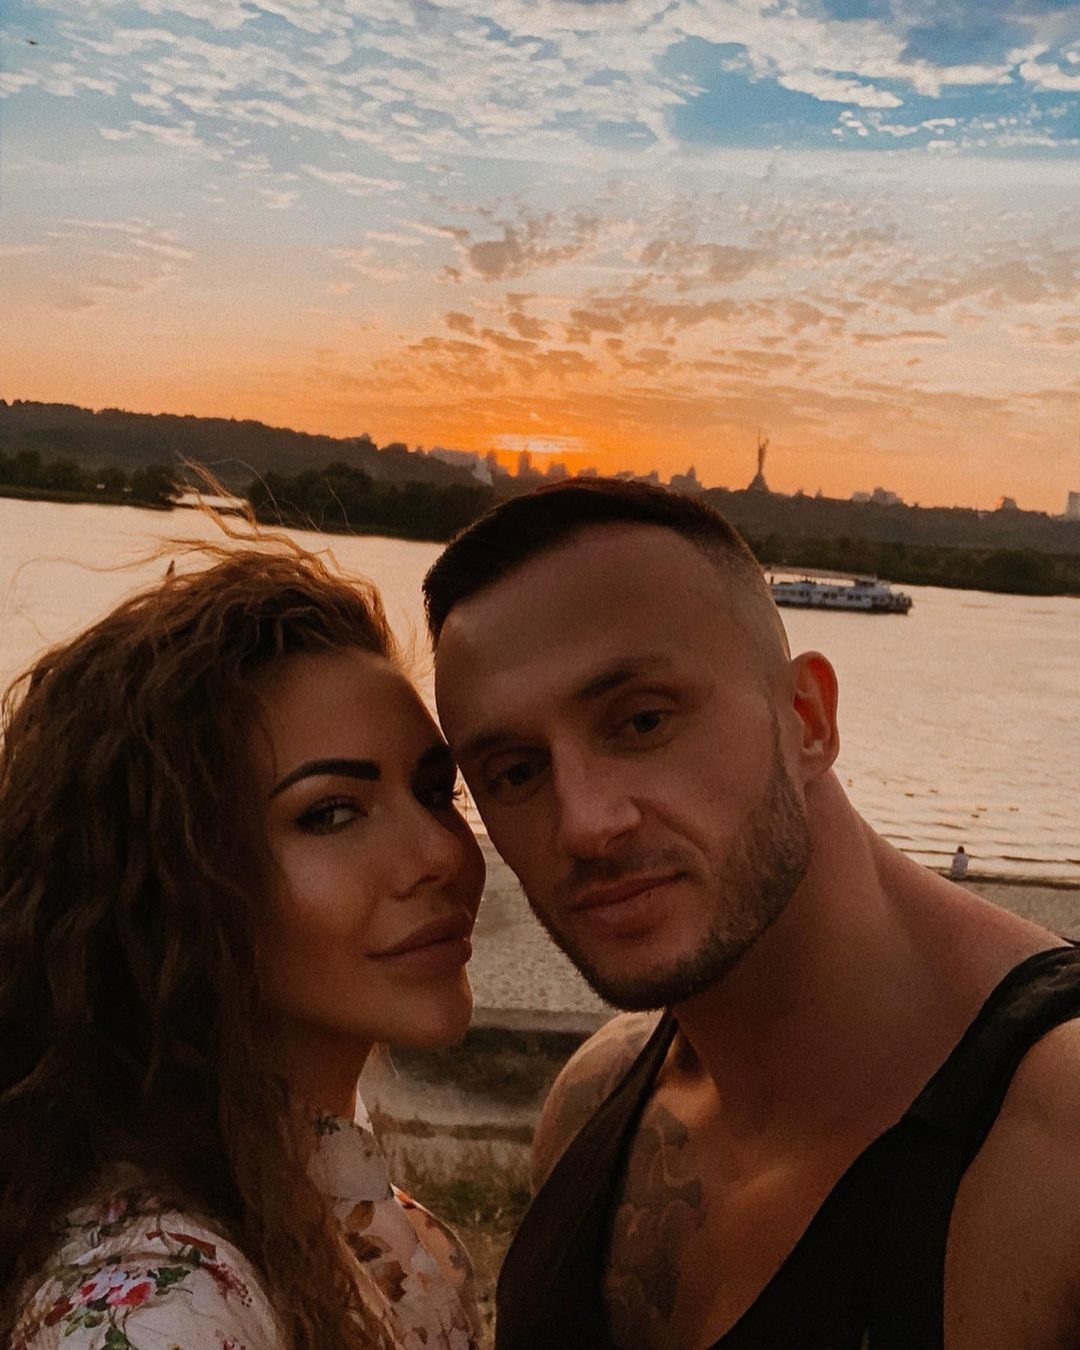 София Стужук и Дмитрий Стужук на фоне заката